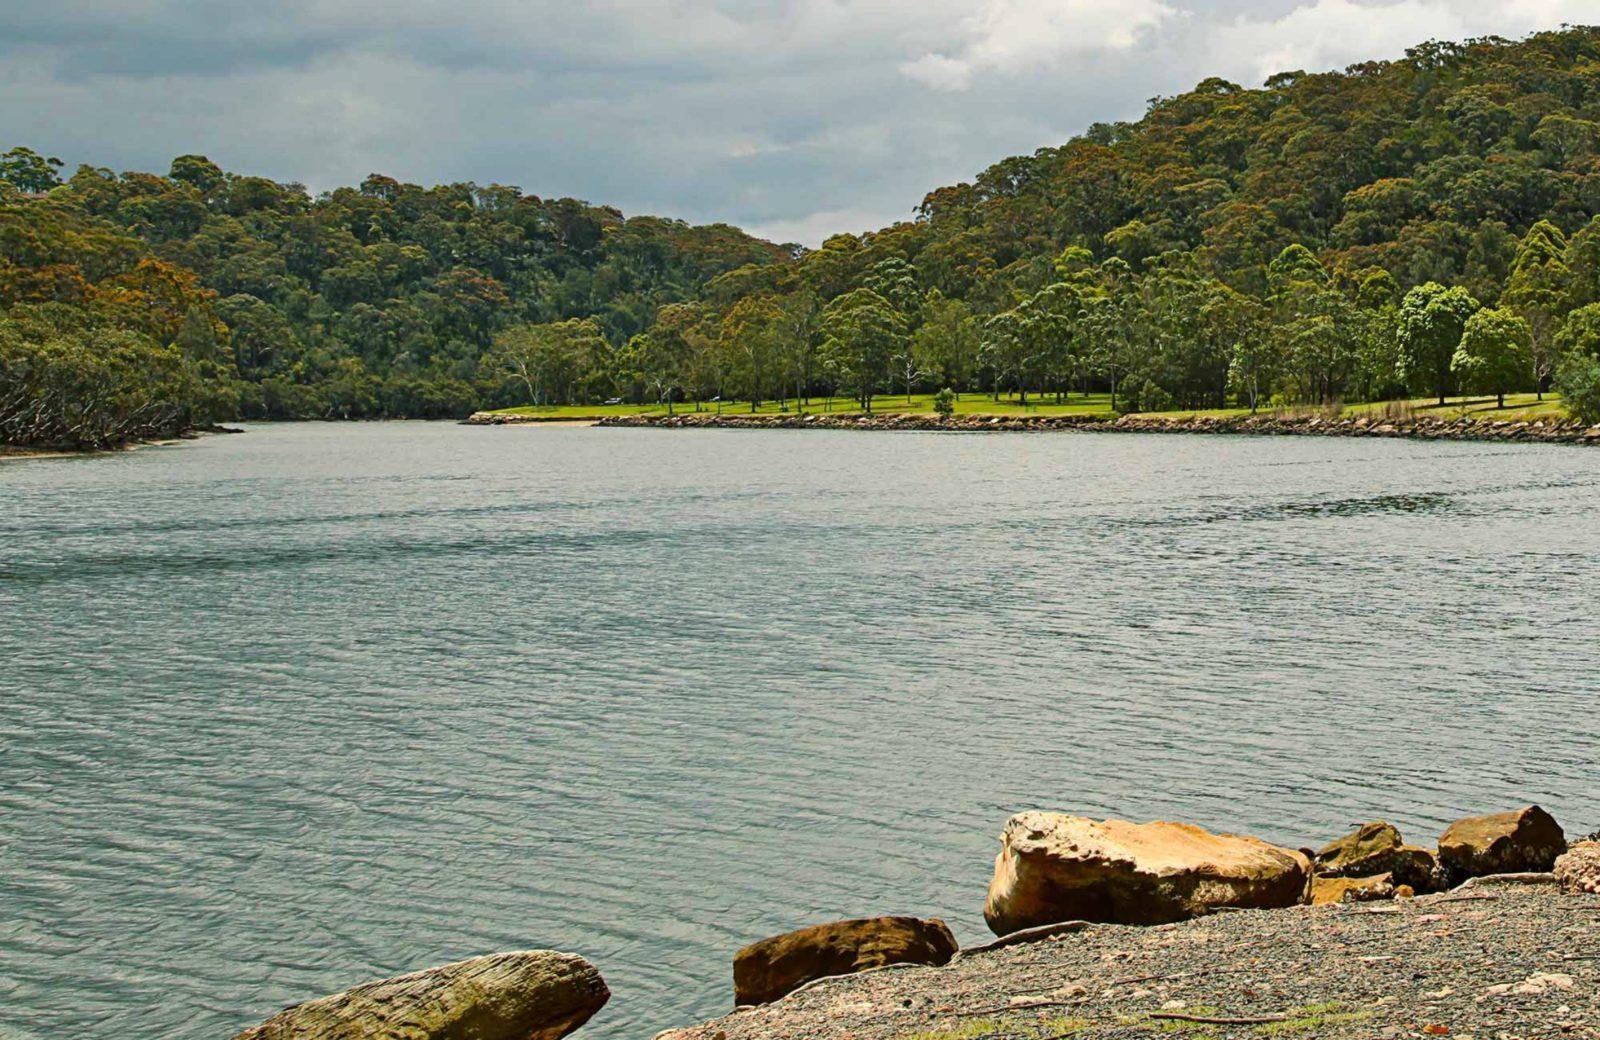 The view along the river. Photo: Shaun Sursok